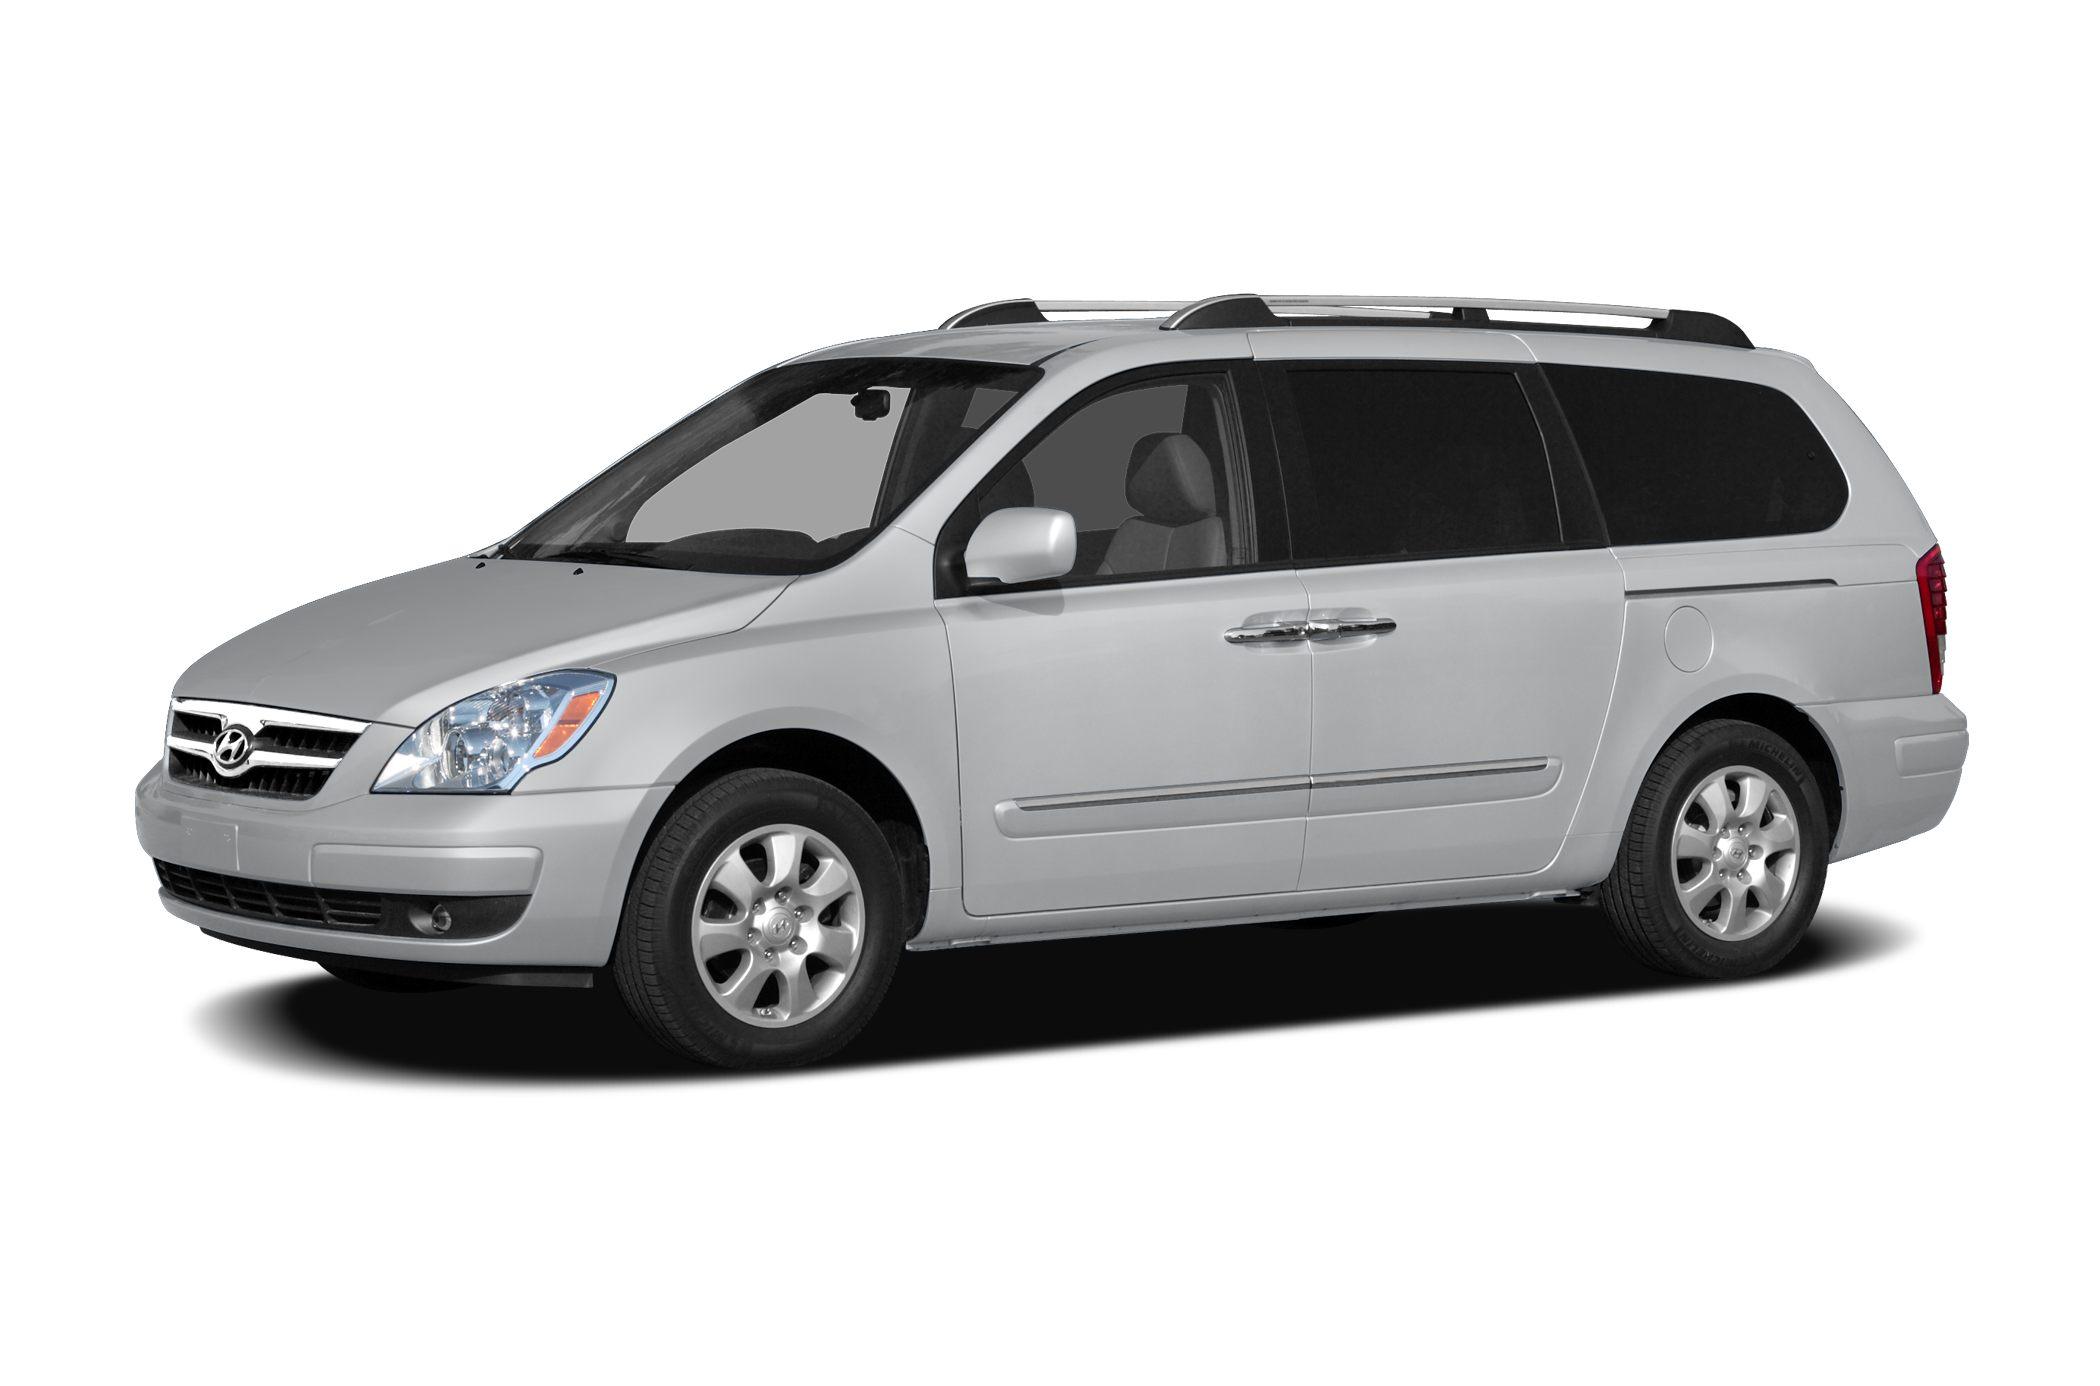 2008 Hyundai Entourage GLS Minivan for sale in Owensboro for $8,788 with 95,605 miles.